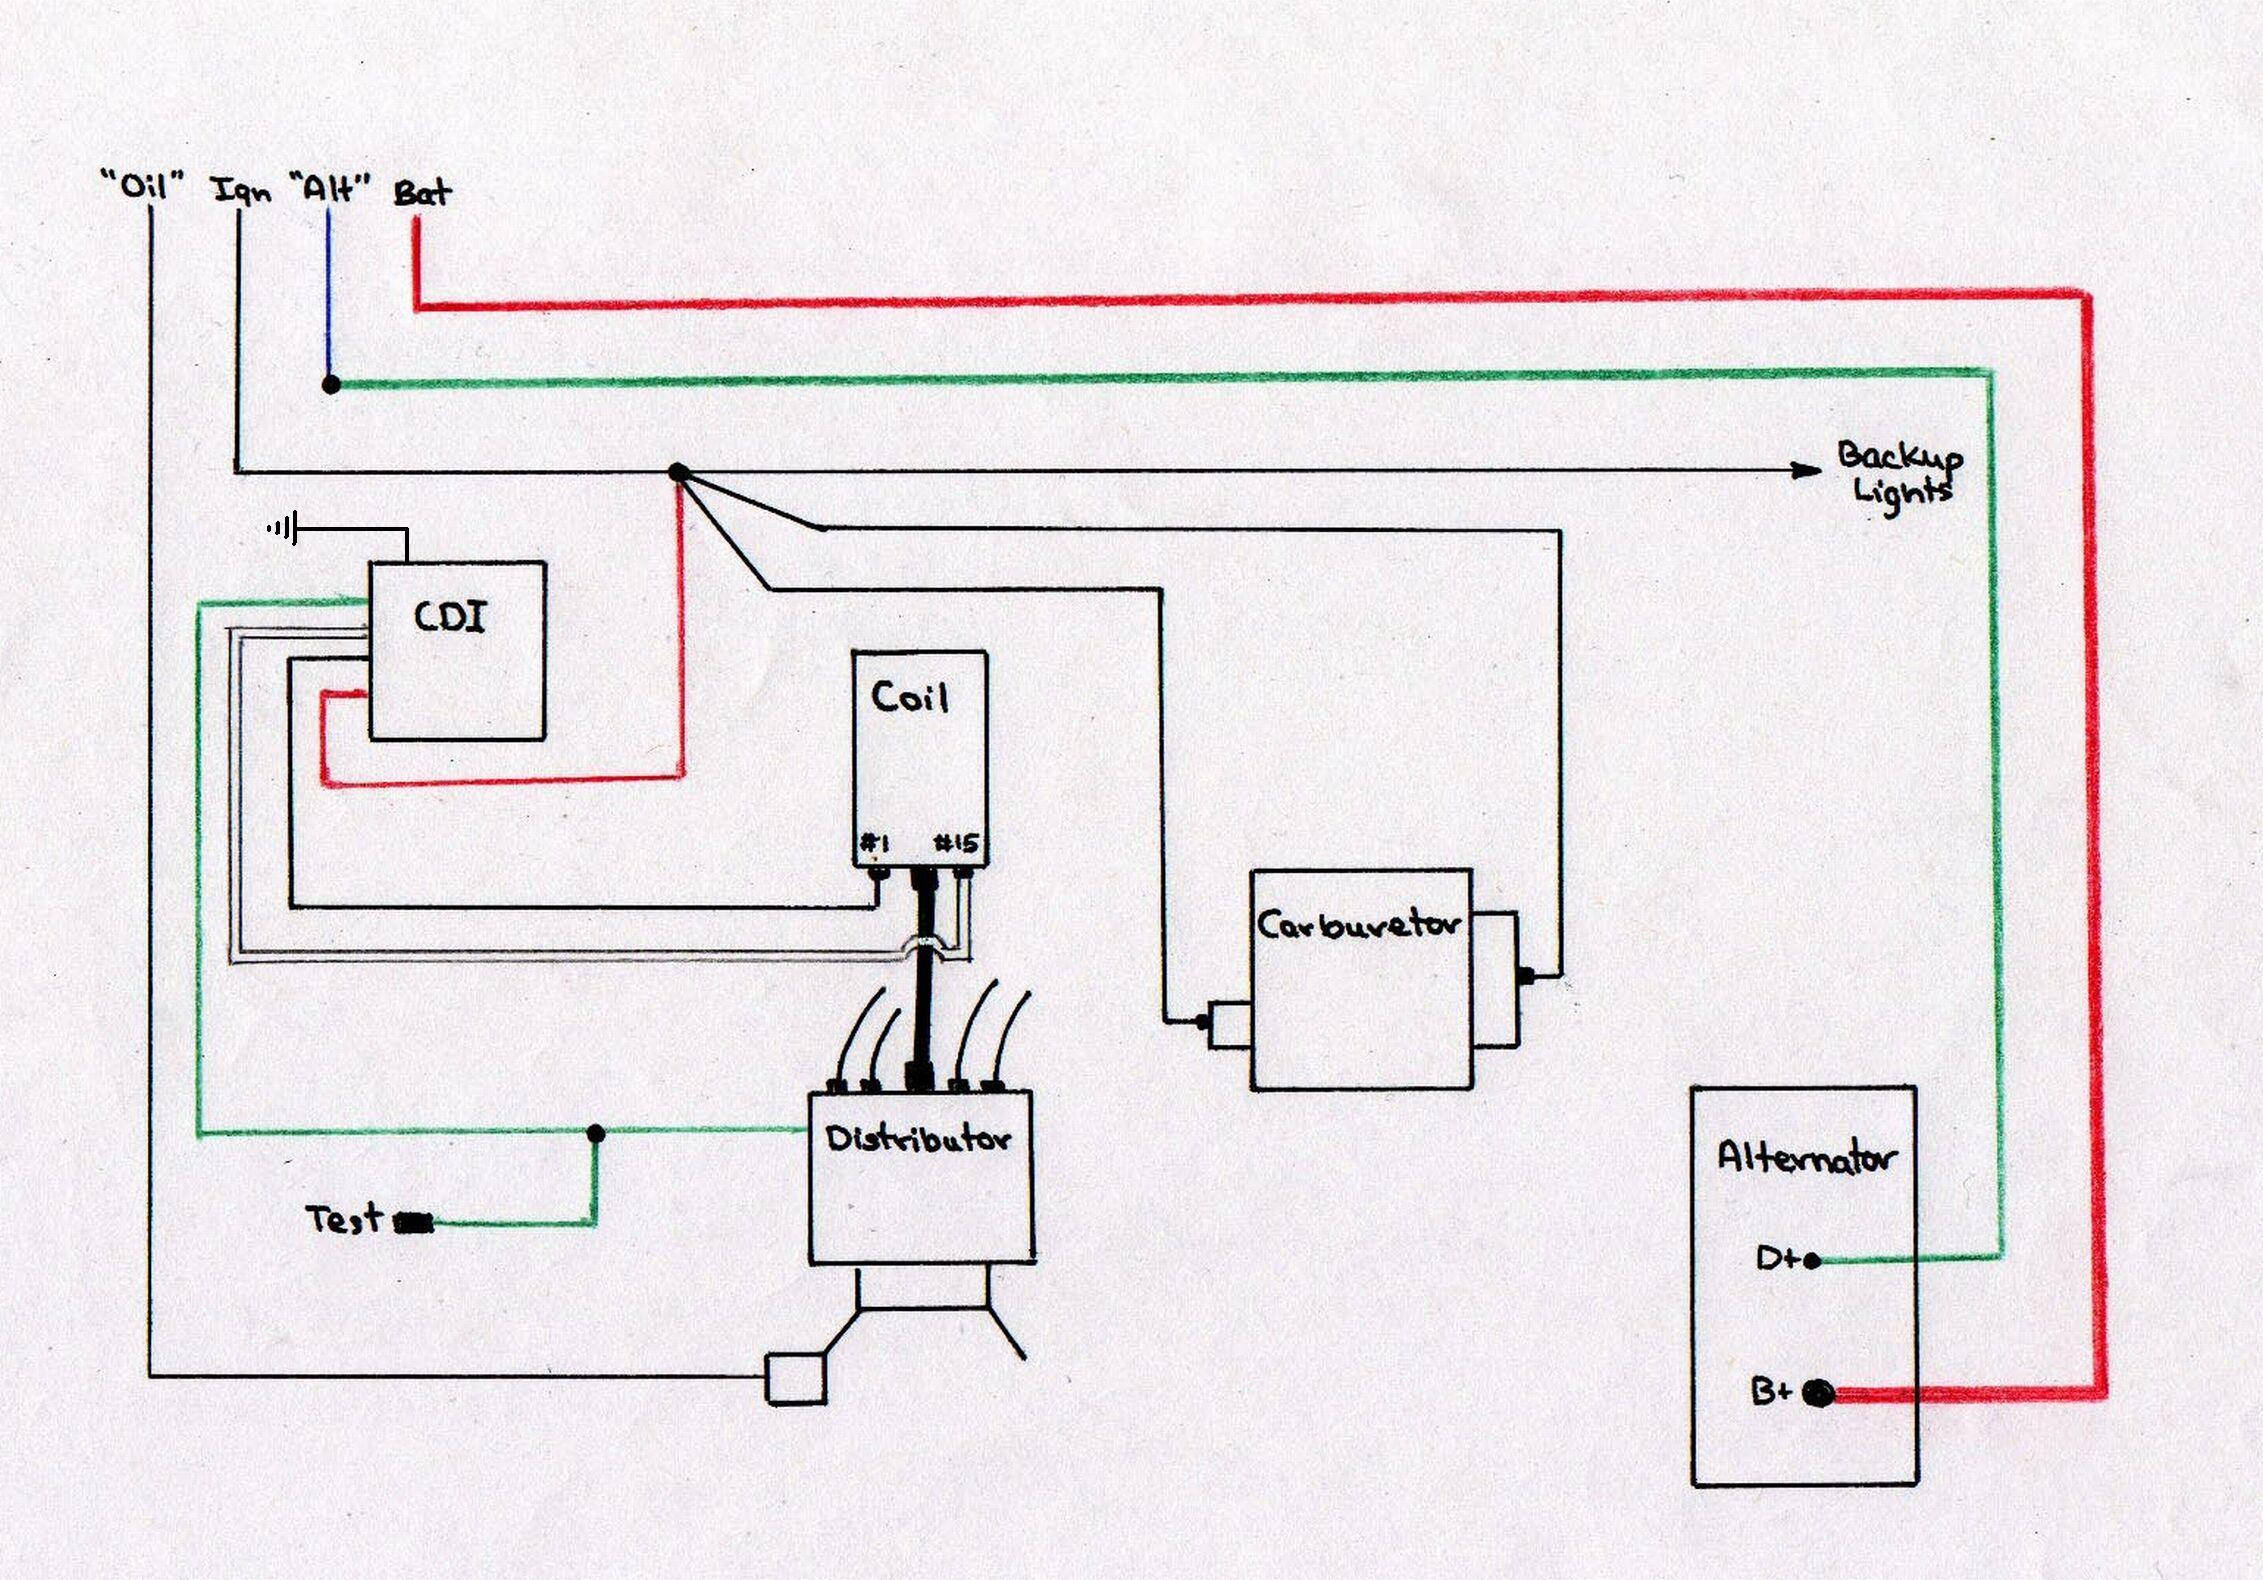 XY_9133] Linhai Atv Wiring Diagram Further Yamaha 250 Atv Wiring Diagram  Wiring DiagramRedne Mimig Anist Gritea Stic Norab Meric Heeve Mohammedshrine Librar Wiring  101